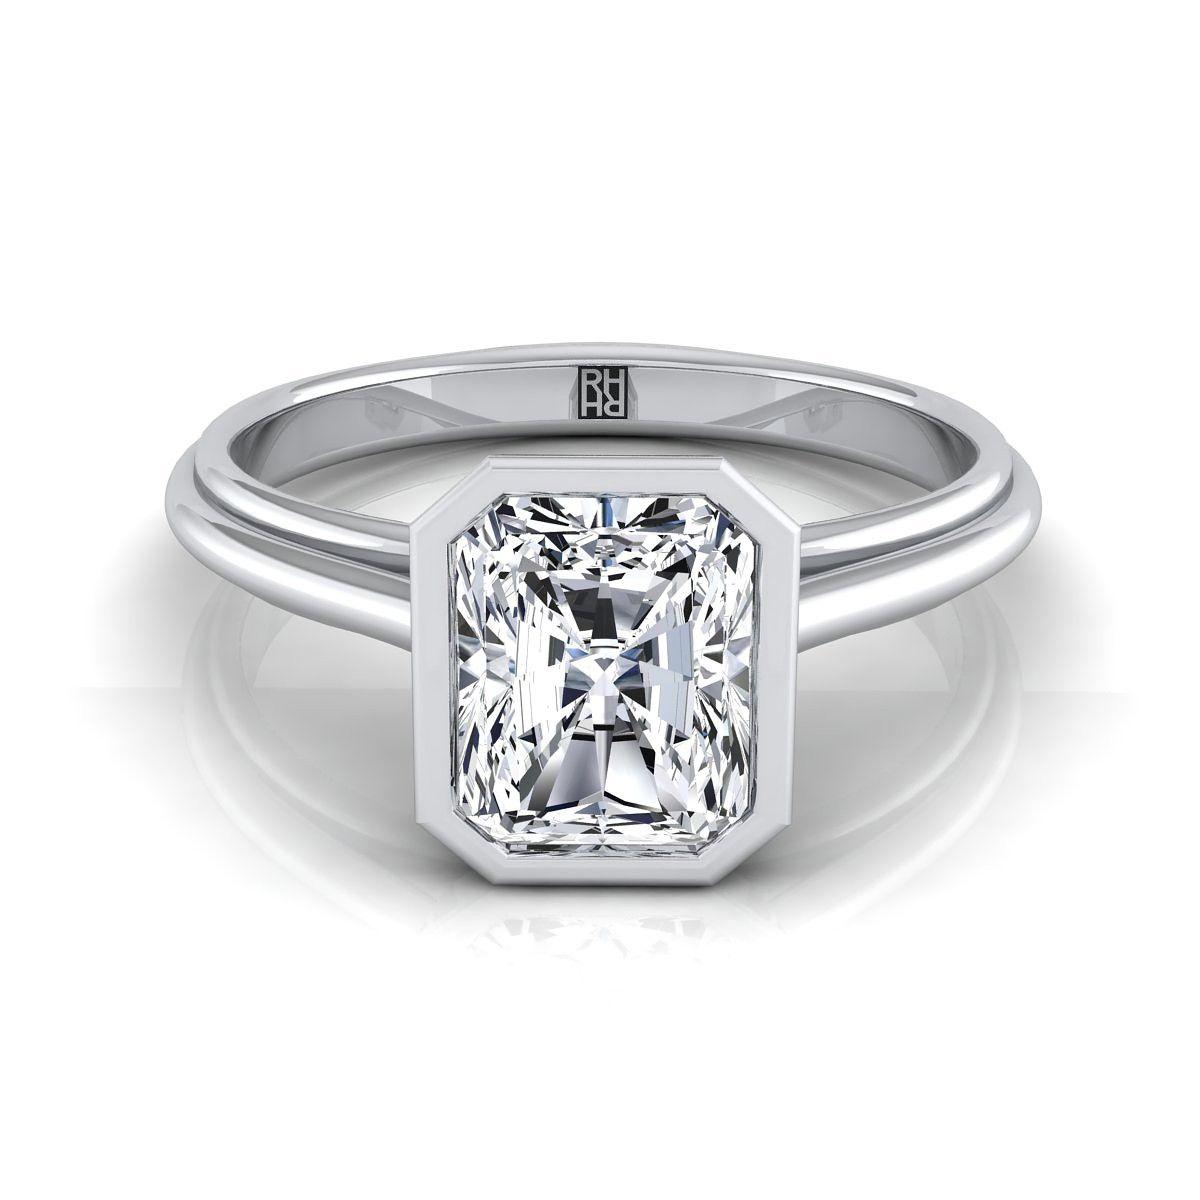 Radiant cut diamond bezel solitaire engagement ring in k white